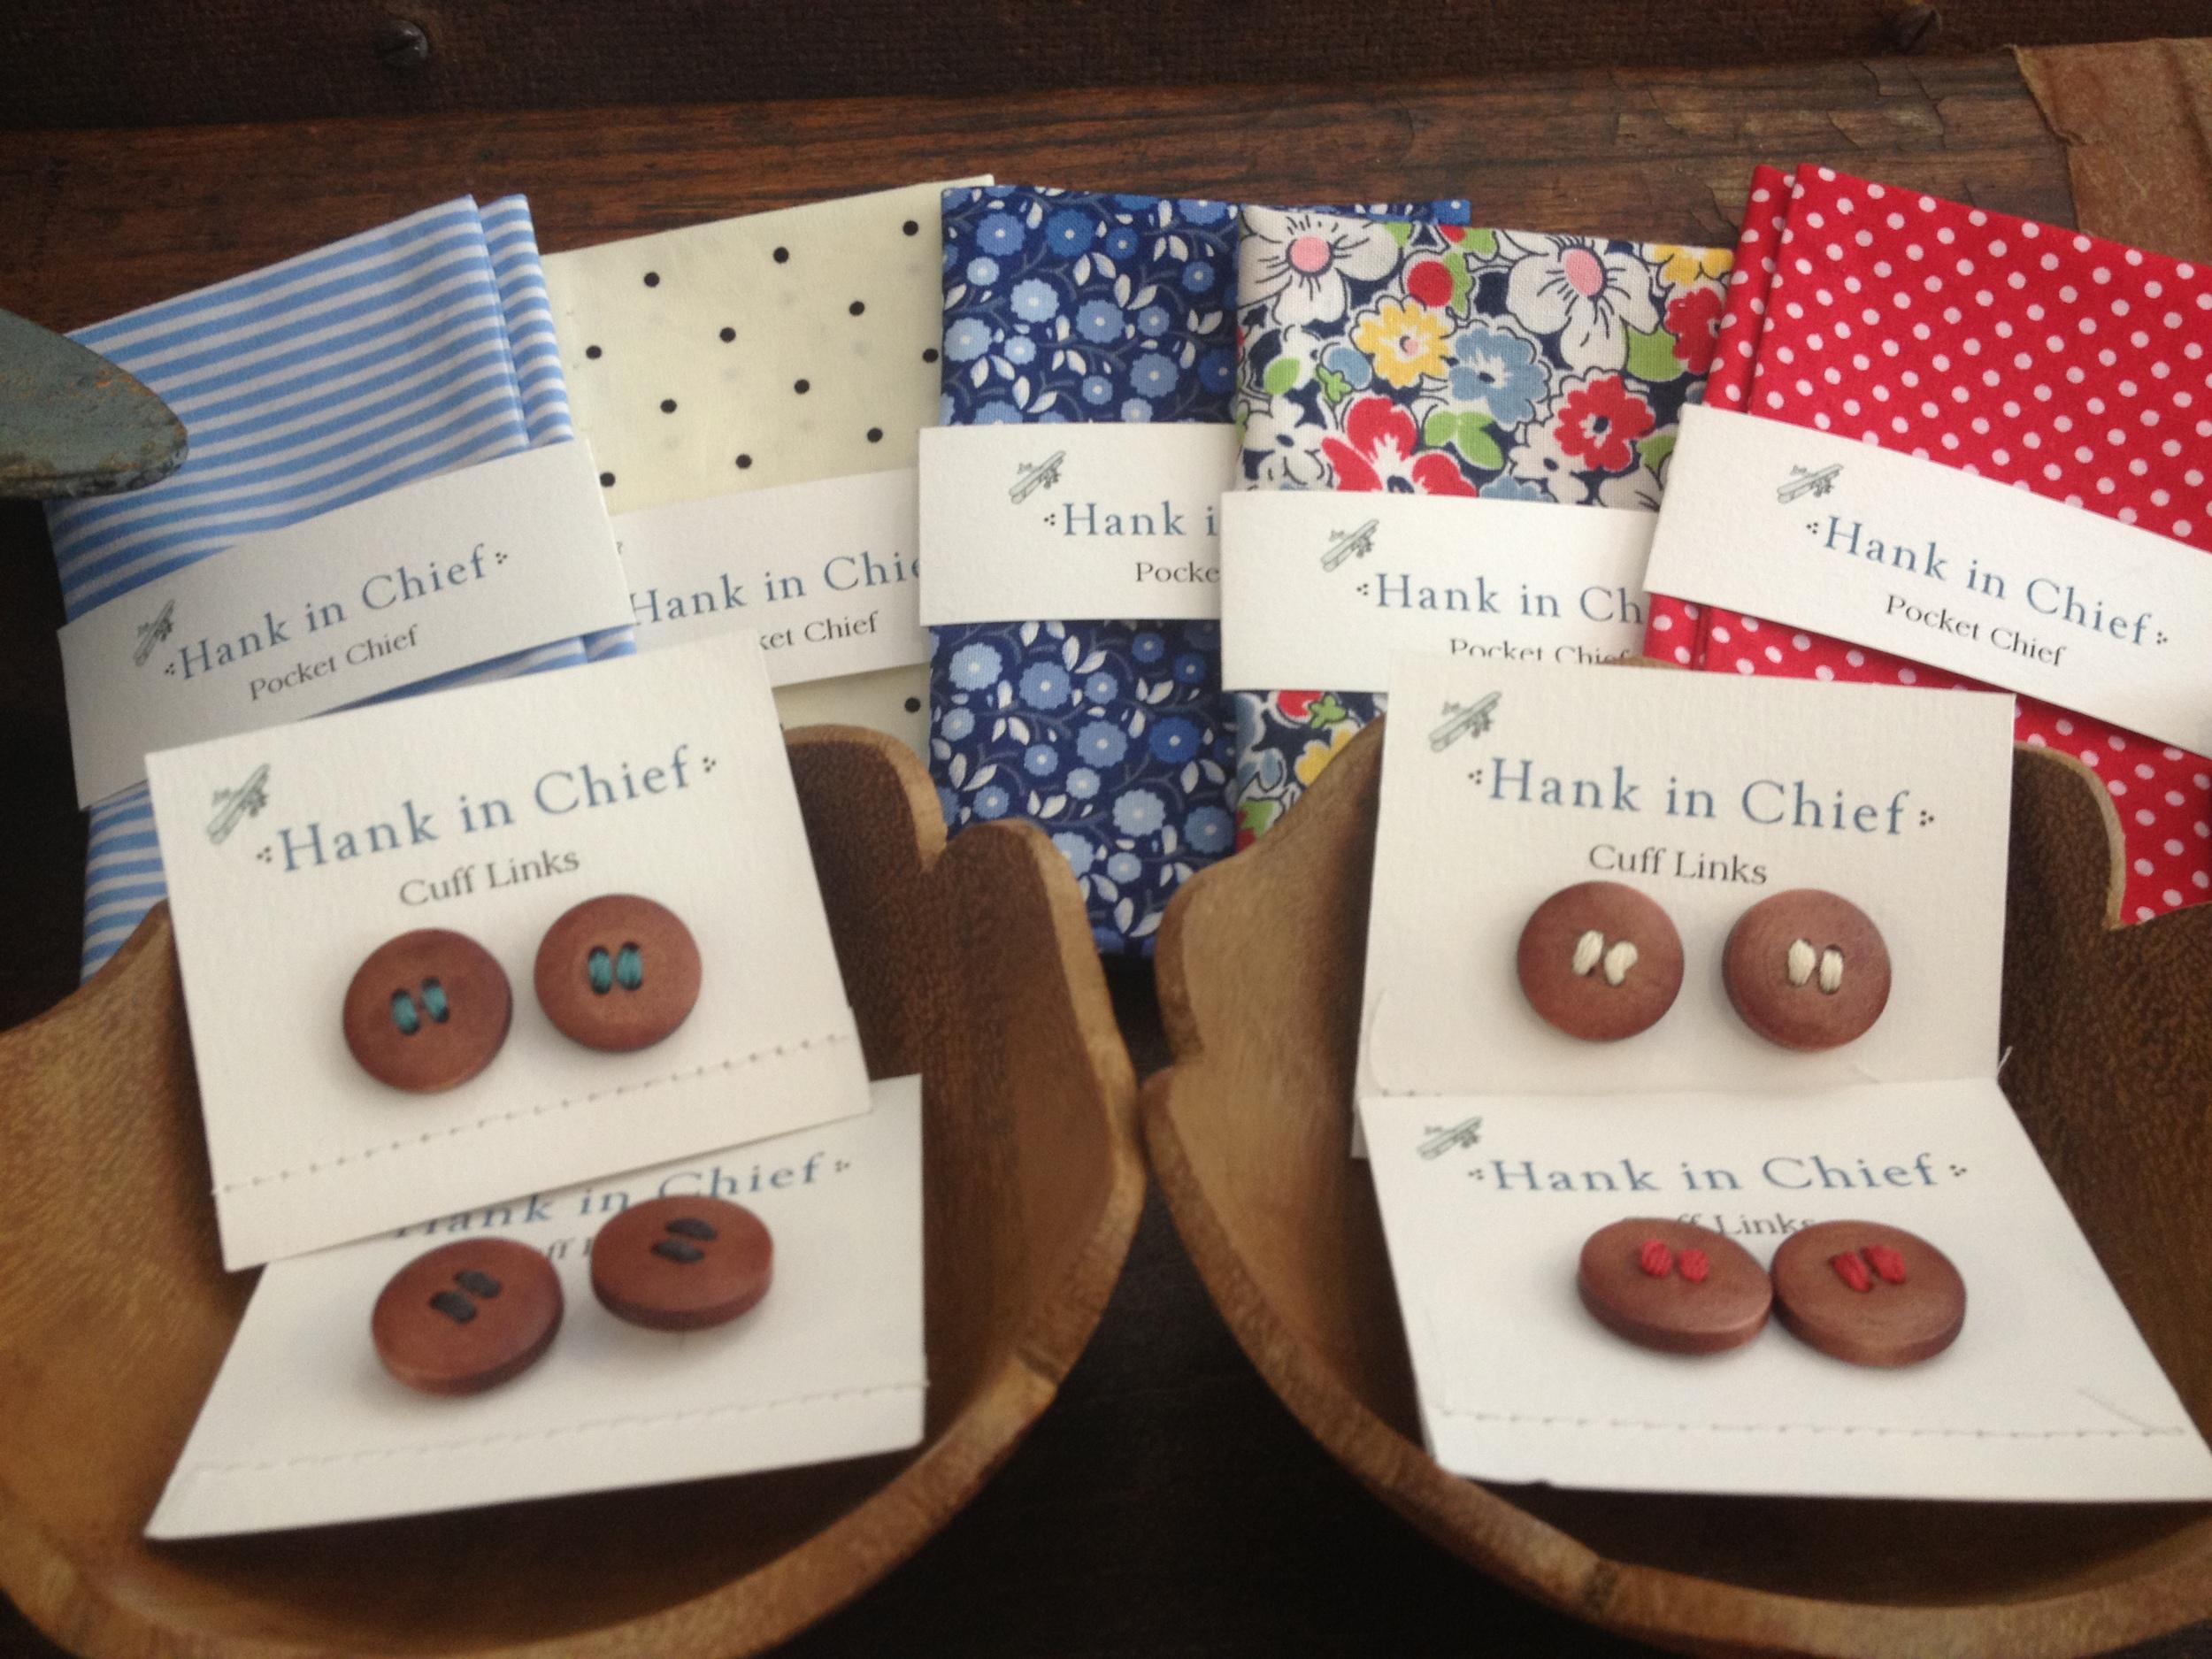 Pocket Chiefs and Cufflinks